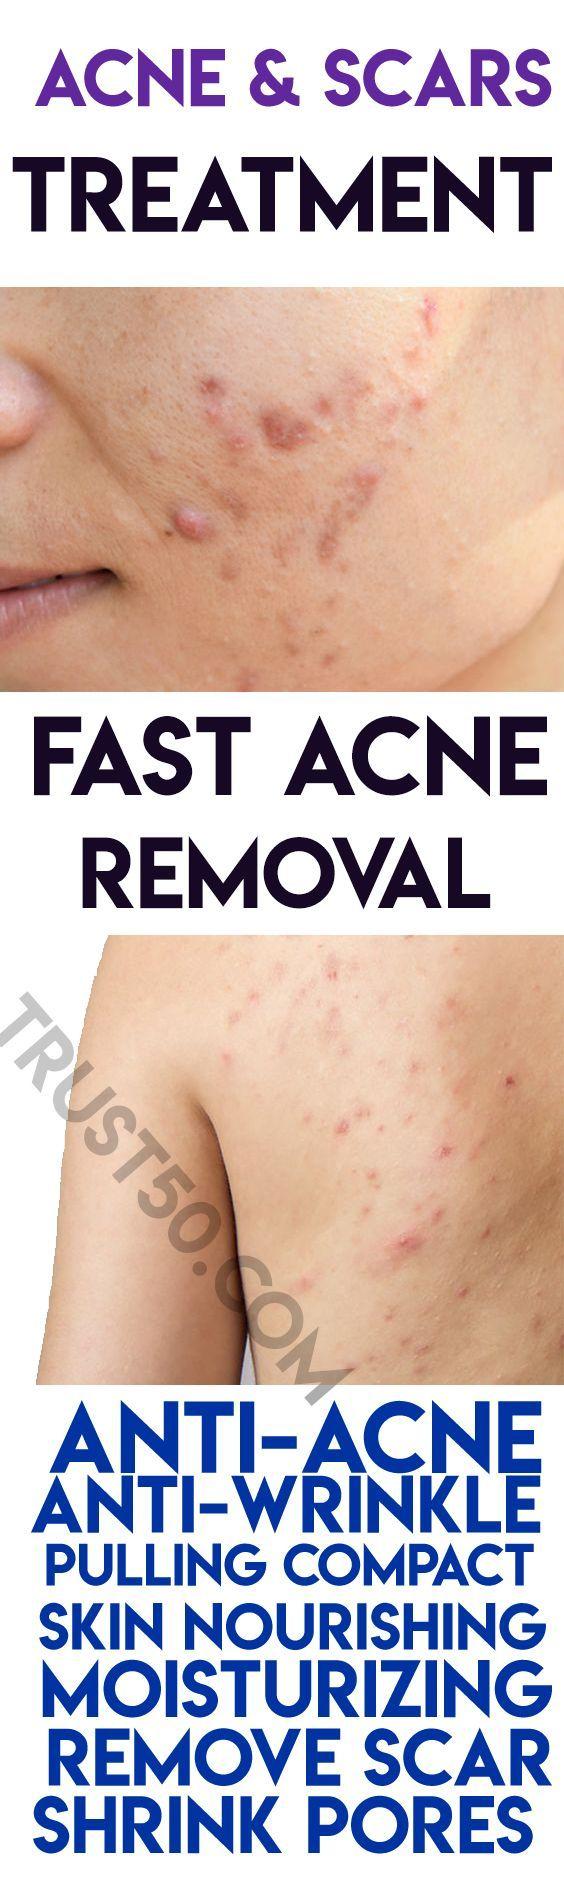 Royal cream acne & scars treatment